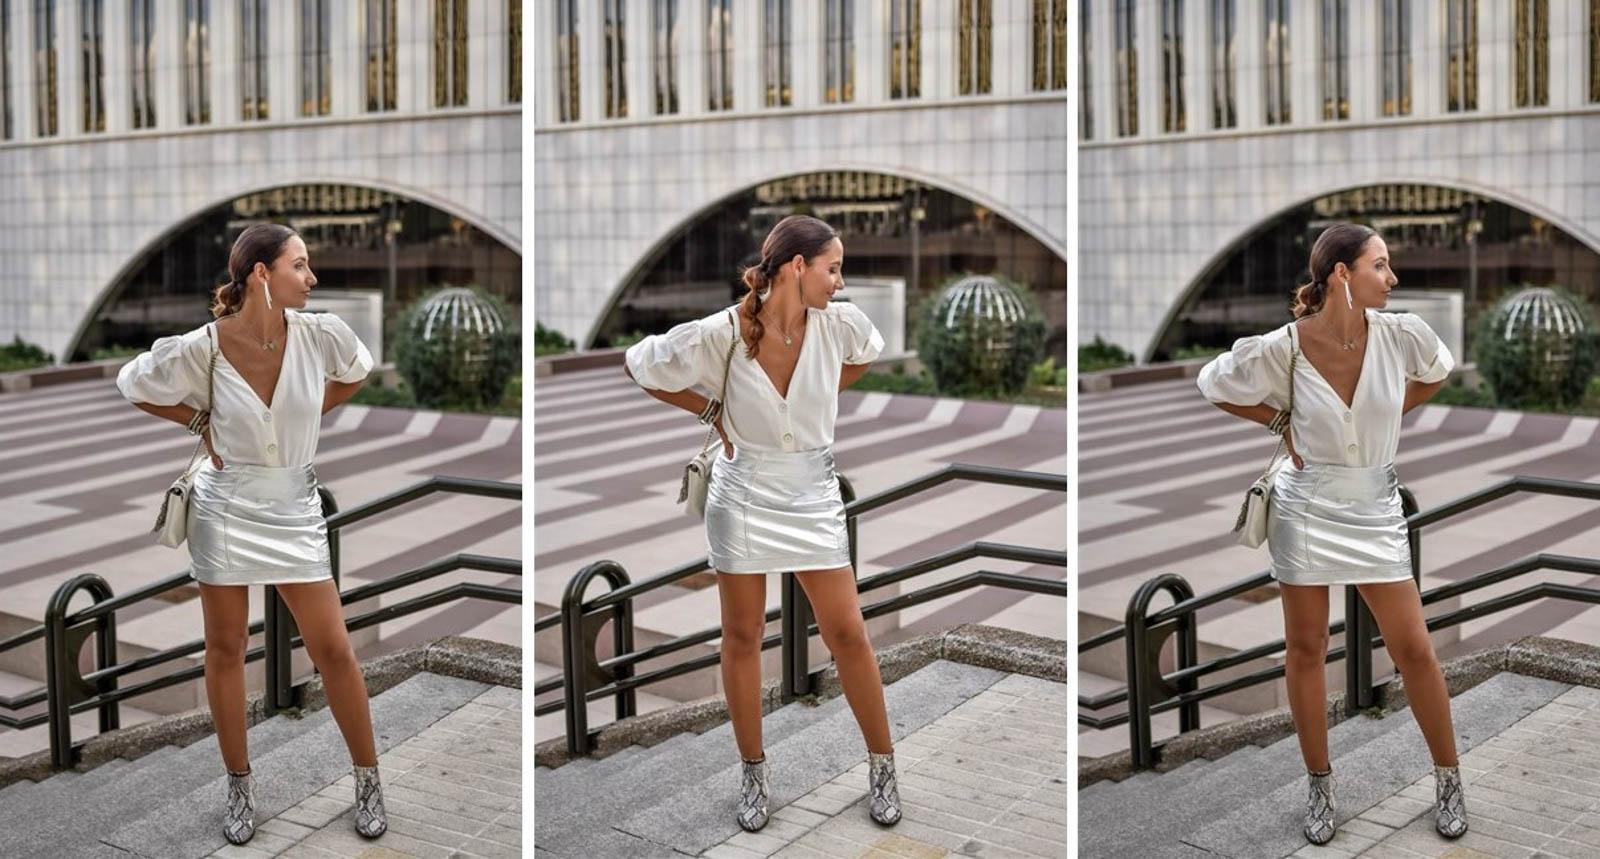 https://www.elblogdesilvia.com/wp-content/uploads/2018/10/el-blog-de-silvia-rodriguez-street-style-madrid-revolve-silver-skirt-h-22.jpg